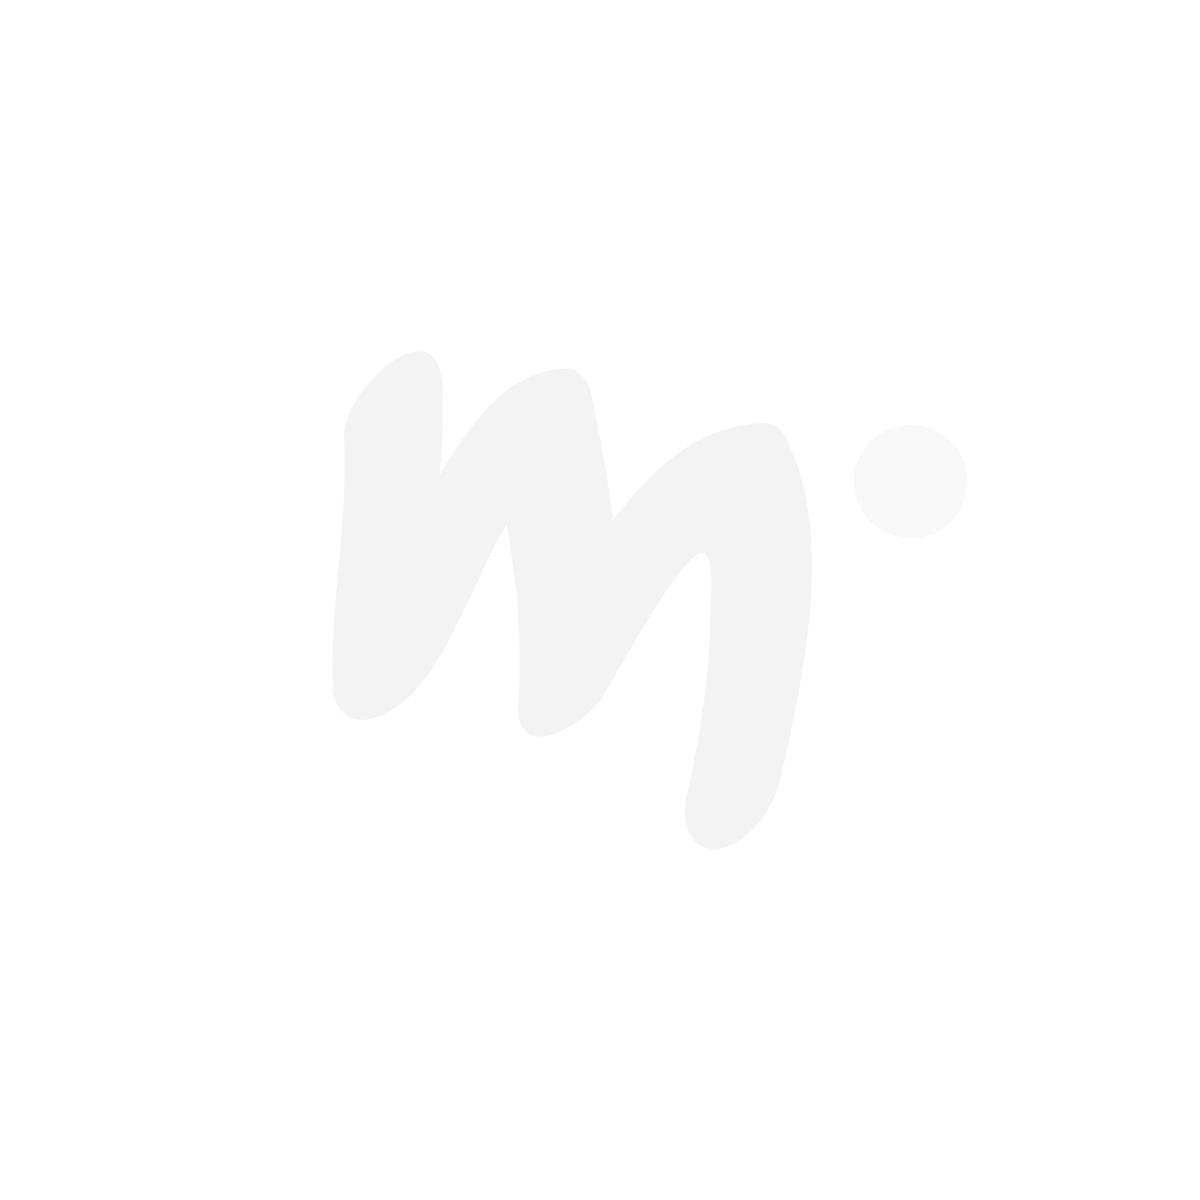 Muumi Syyshetki -tunika harmaa